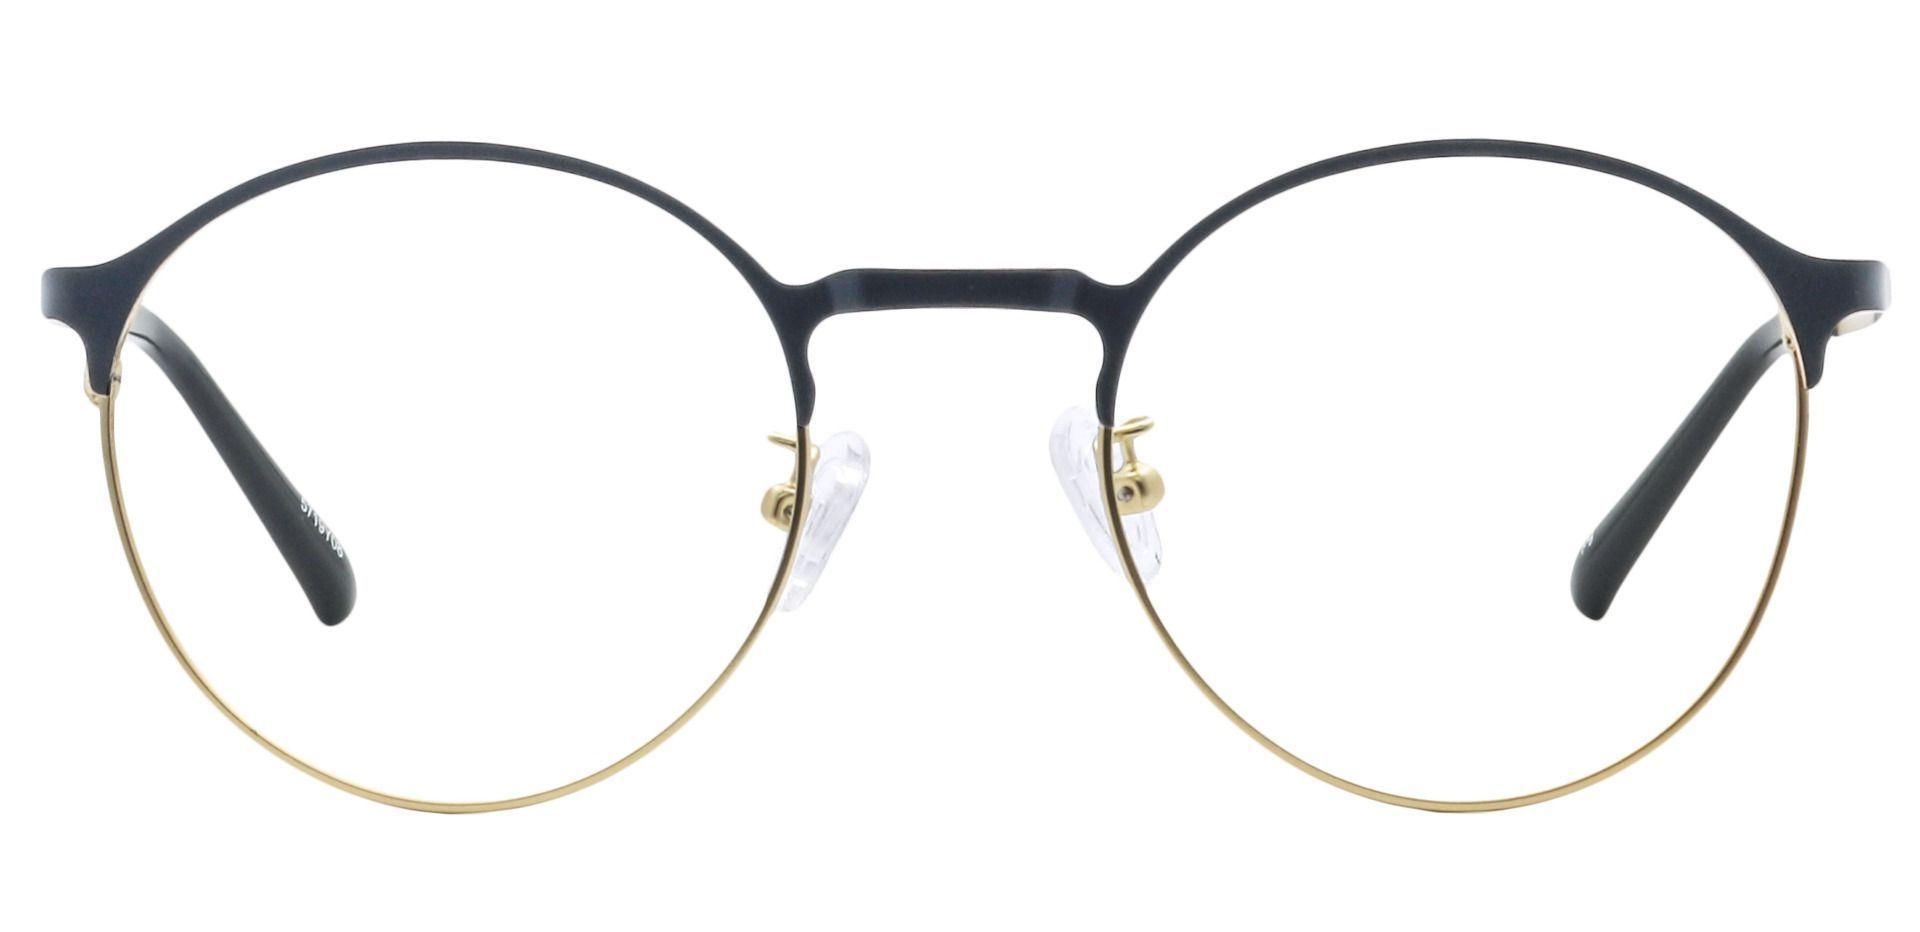 Perry Round Prescription Glasses - Yellow